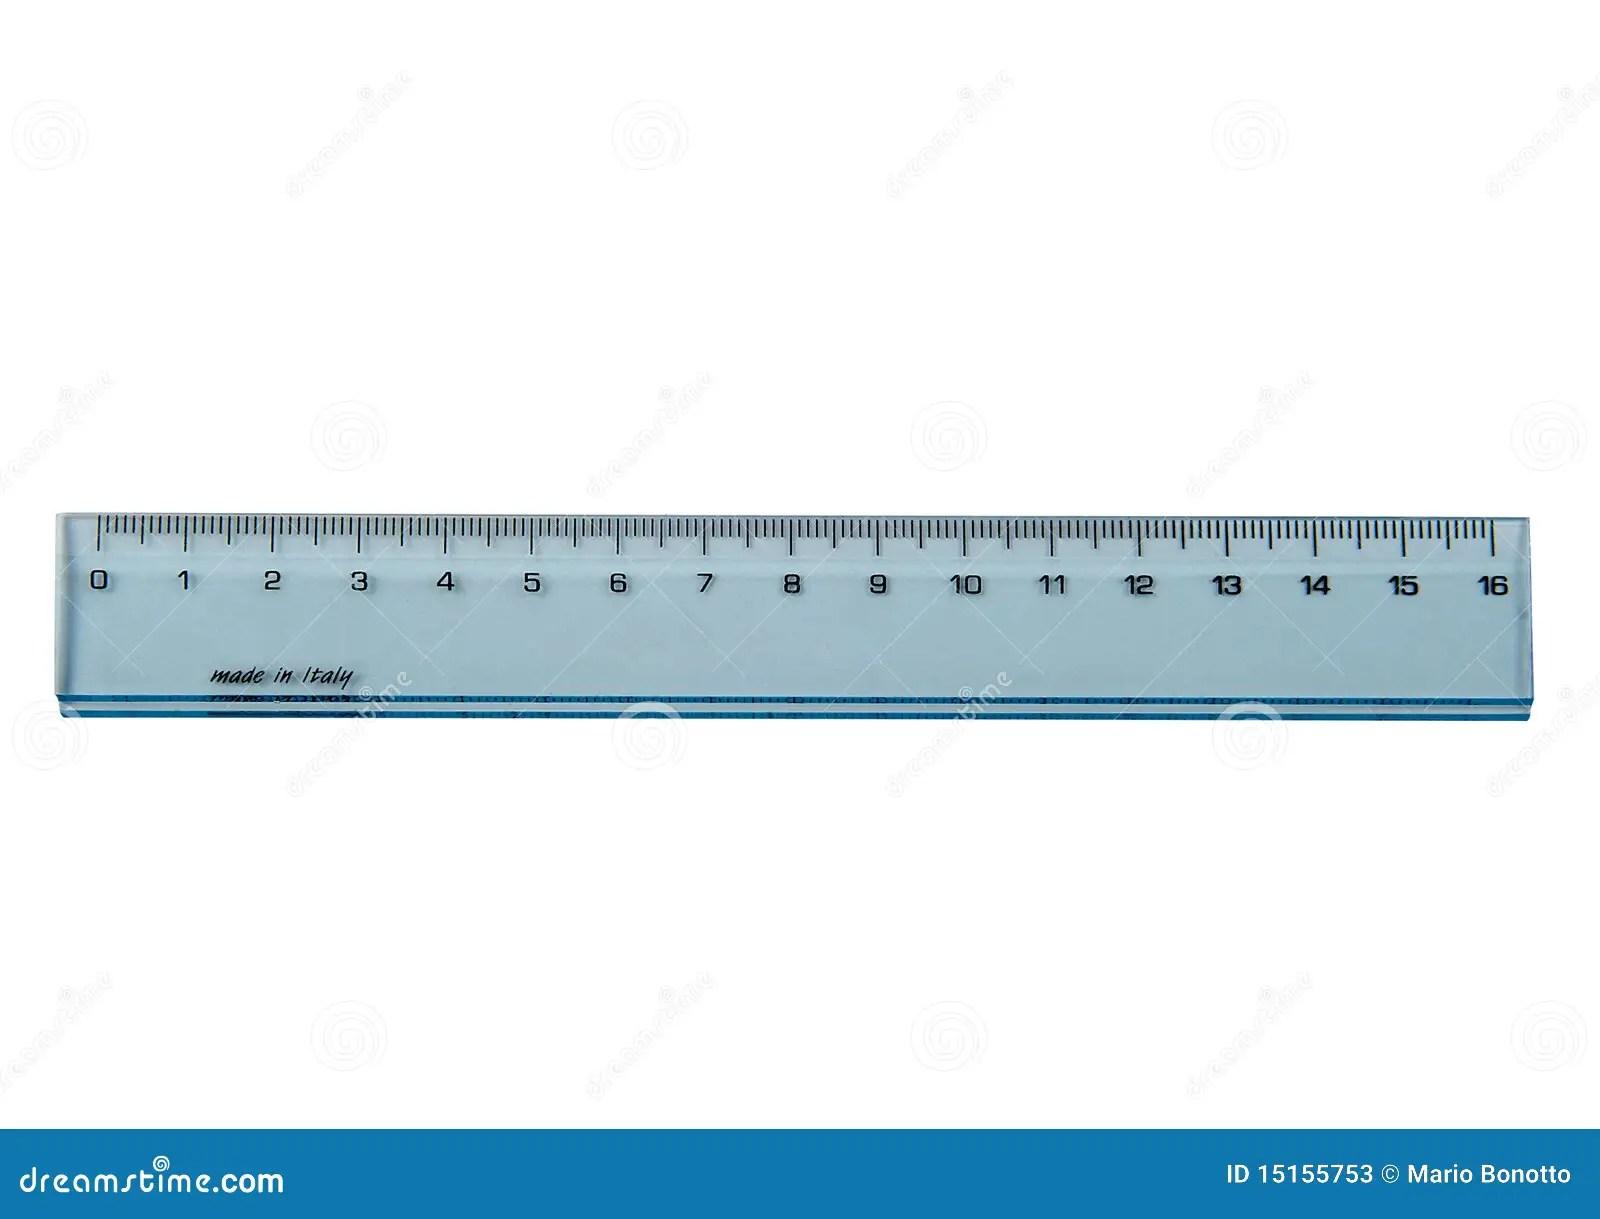 Millimeter Ruler Stock Image Image Of Measurement Technical